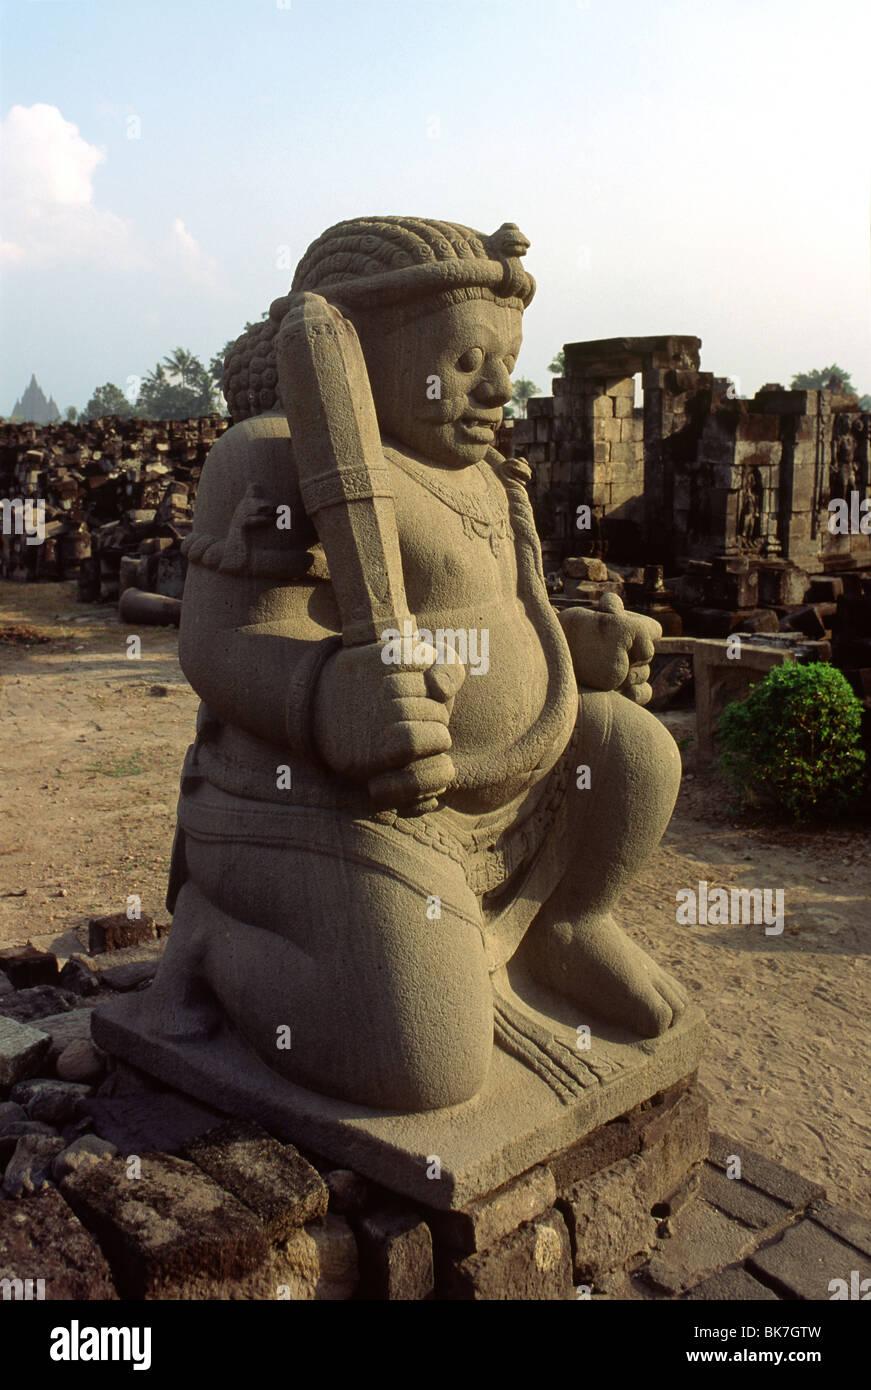 Guardian statue au temple de Candi Sewu, au nord-ouest de Yogyakarta, Java, Indonésie, Asie du Sud, Asie Photo Stock